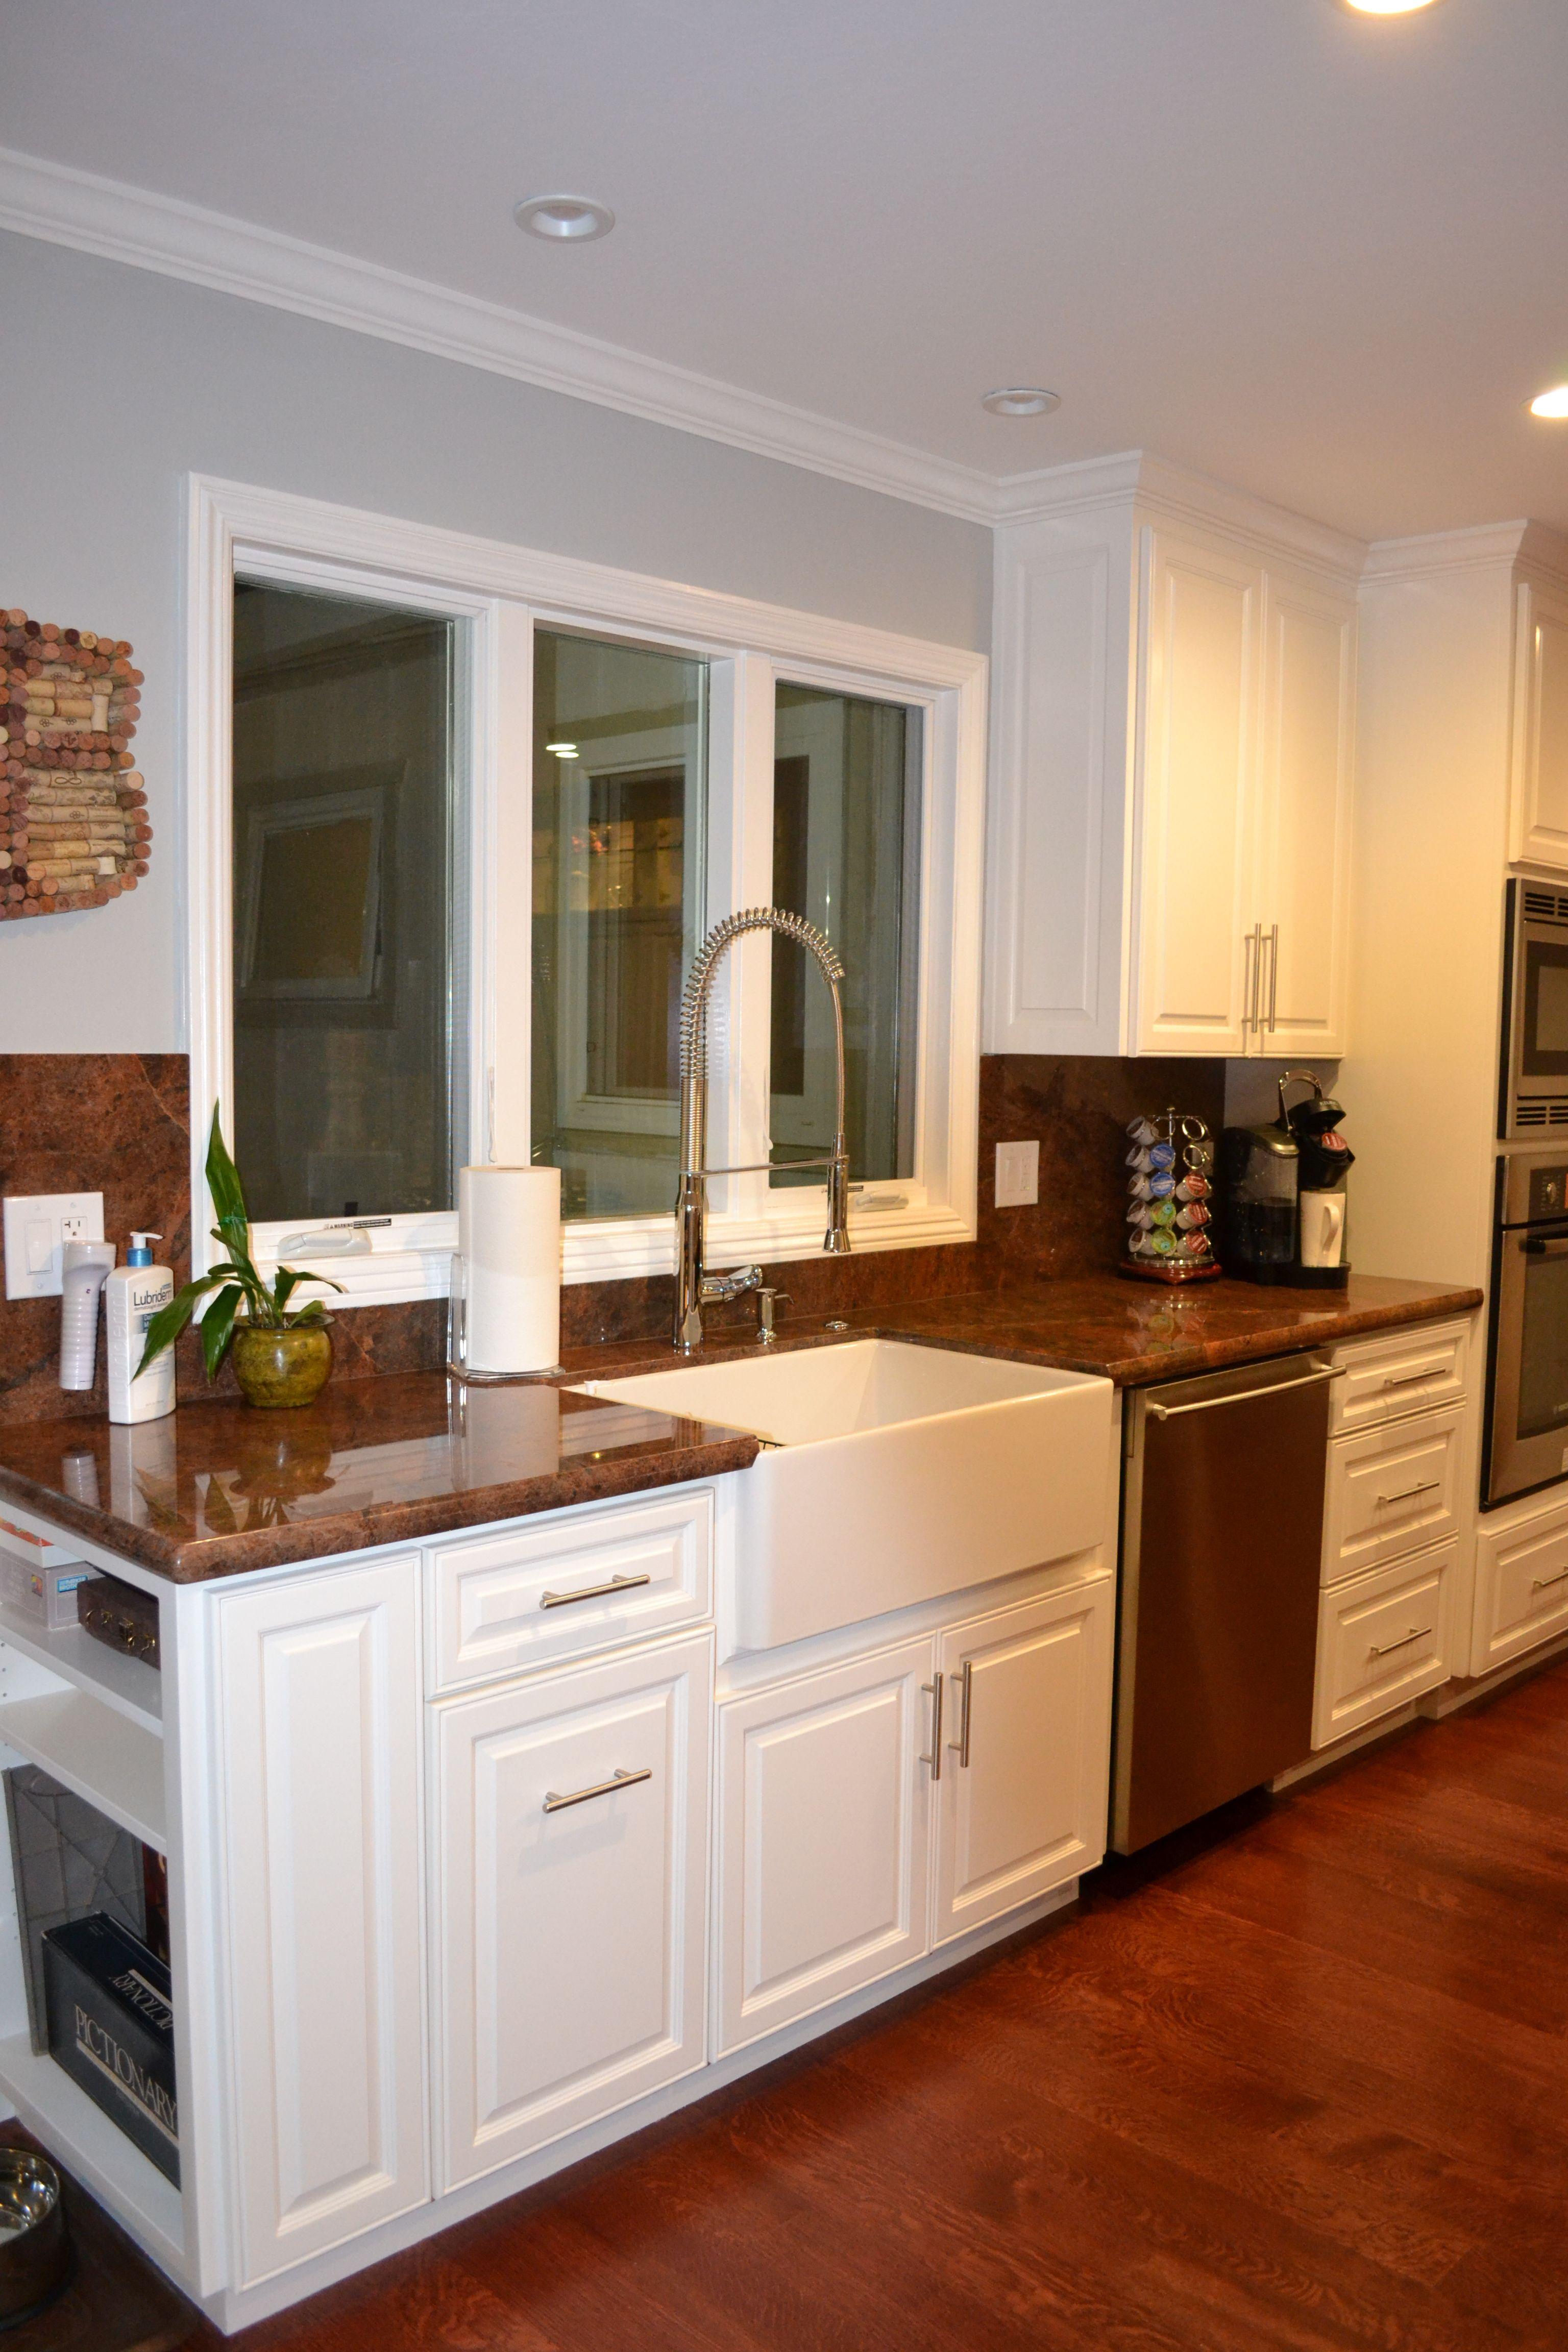 Small Kitchen Farm Sink : Small kitchen remodel. Farmhouse sink kitchen ideas Pinterest